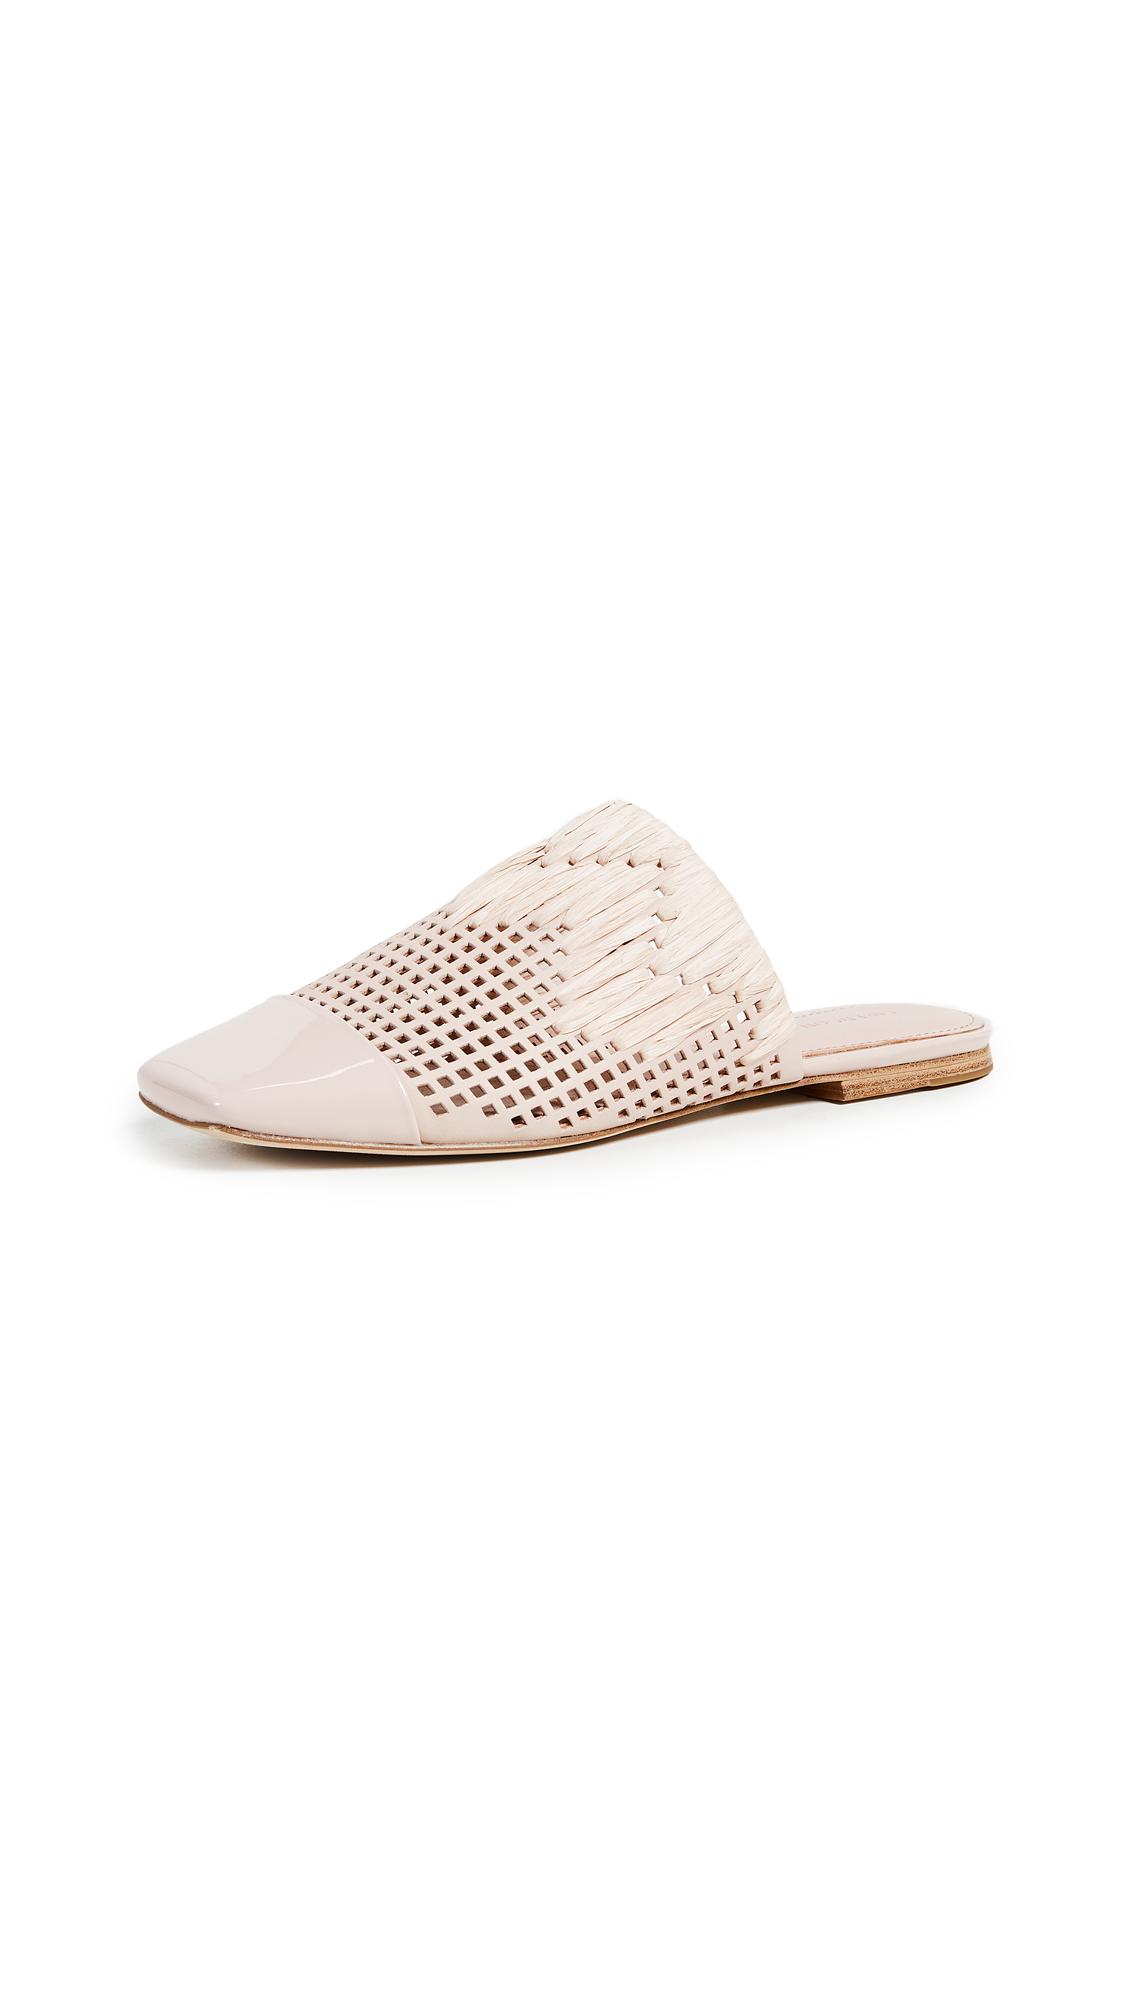 Photo of Sigerson Morrison Gallia Woven Slides - buy Sigerson Morrison shoes